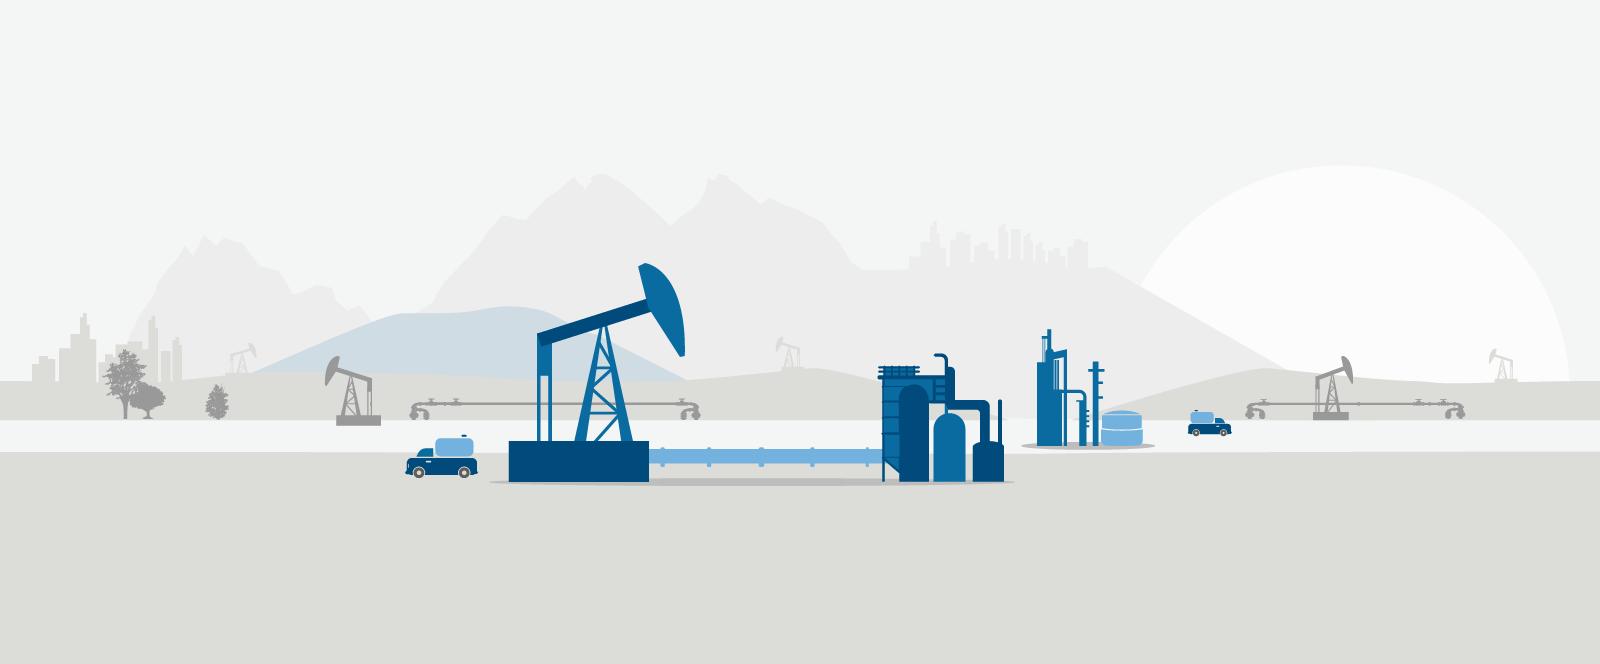 Olio e gas